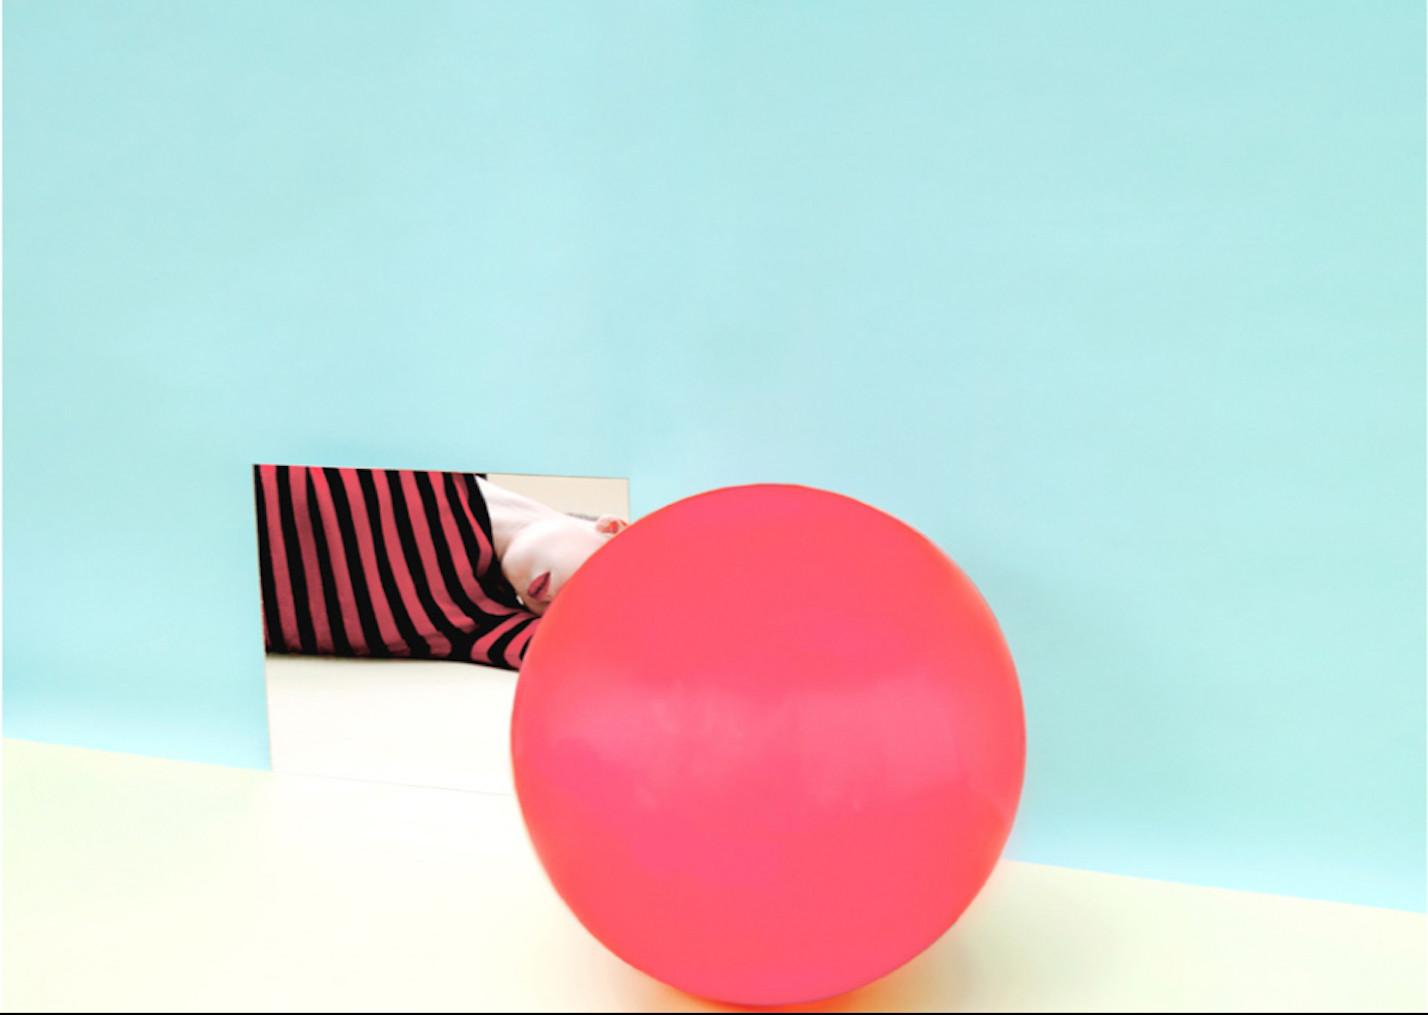 A ball. The Cut / New York Magazine | Ina Jang | 2013